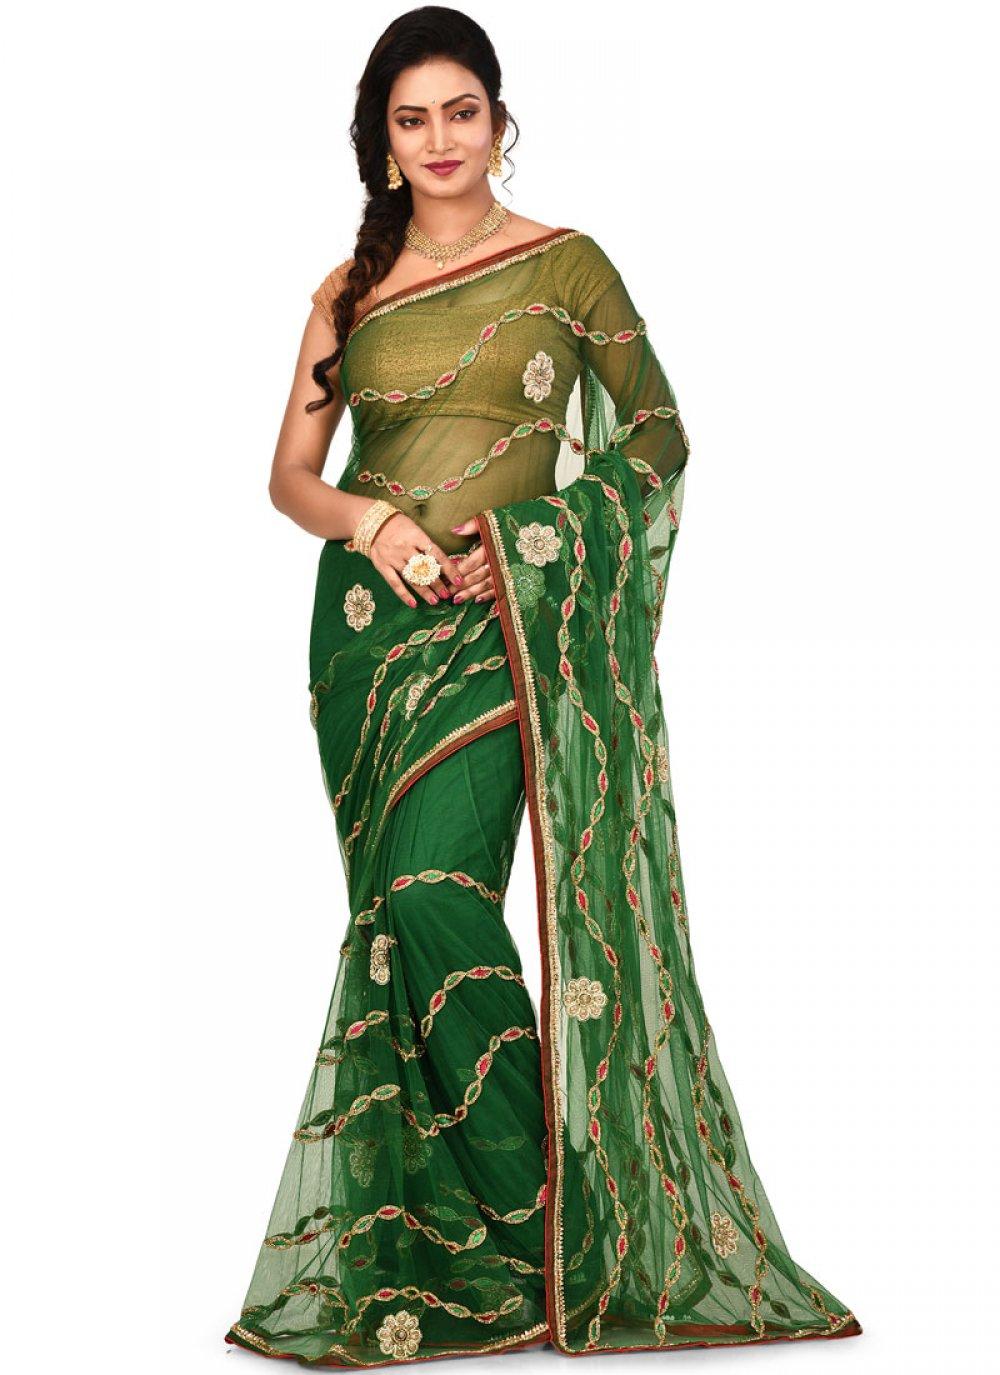 Green Embroidered Mehndi Designer Saree